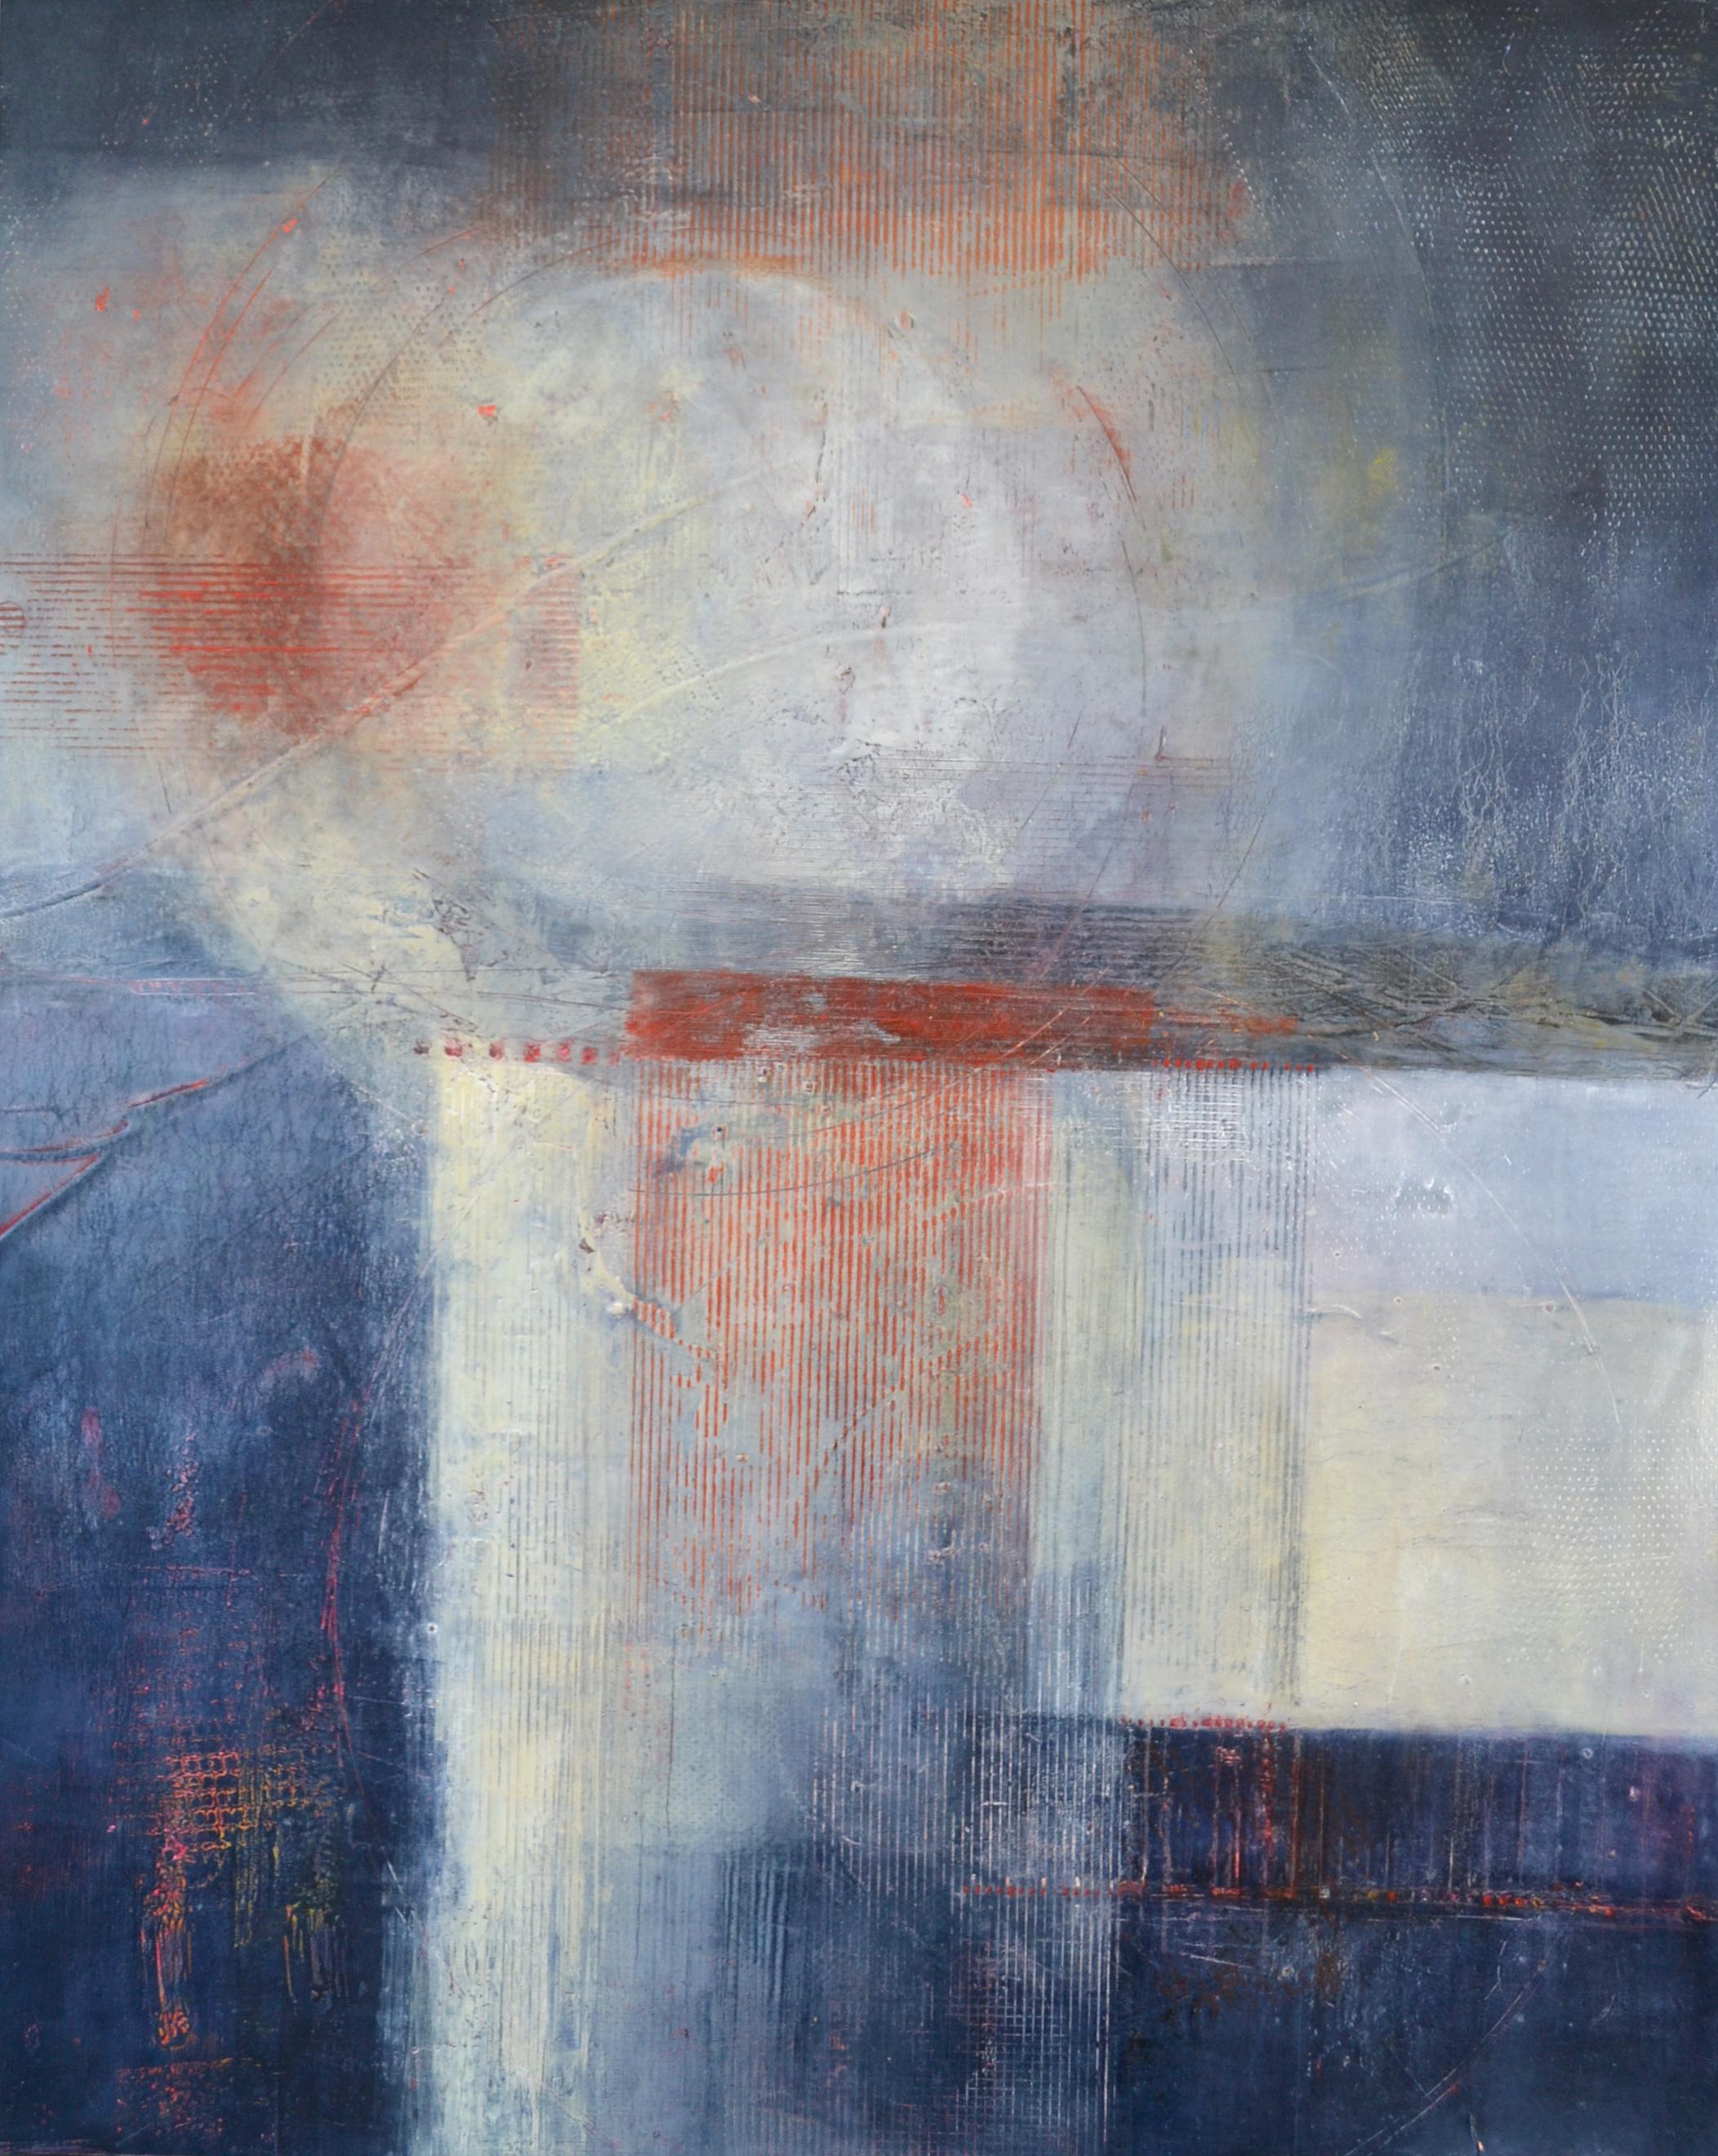 Wendy Morosoff Smith Studio + Gallery